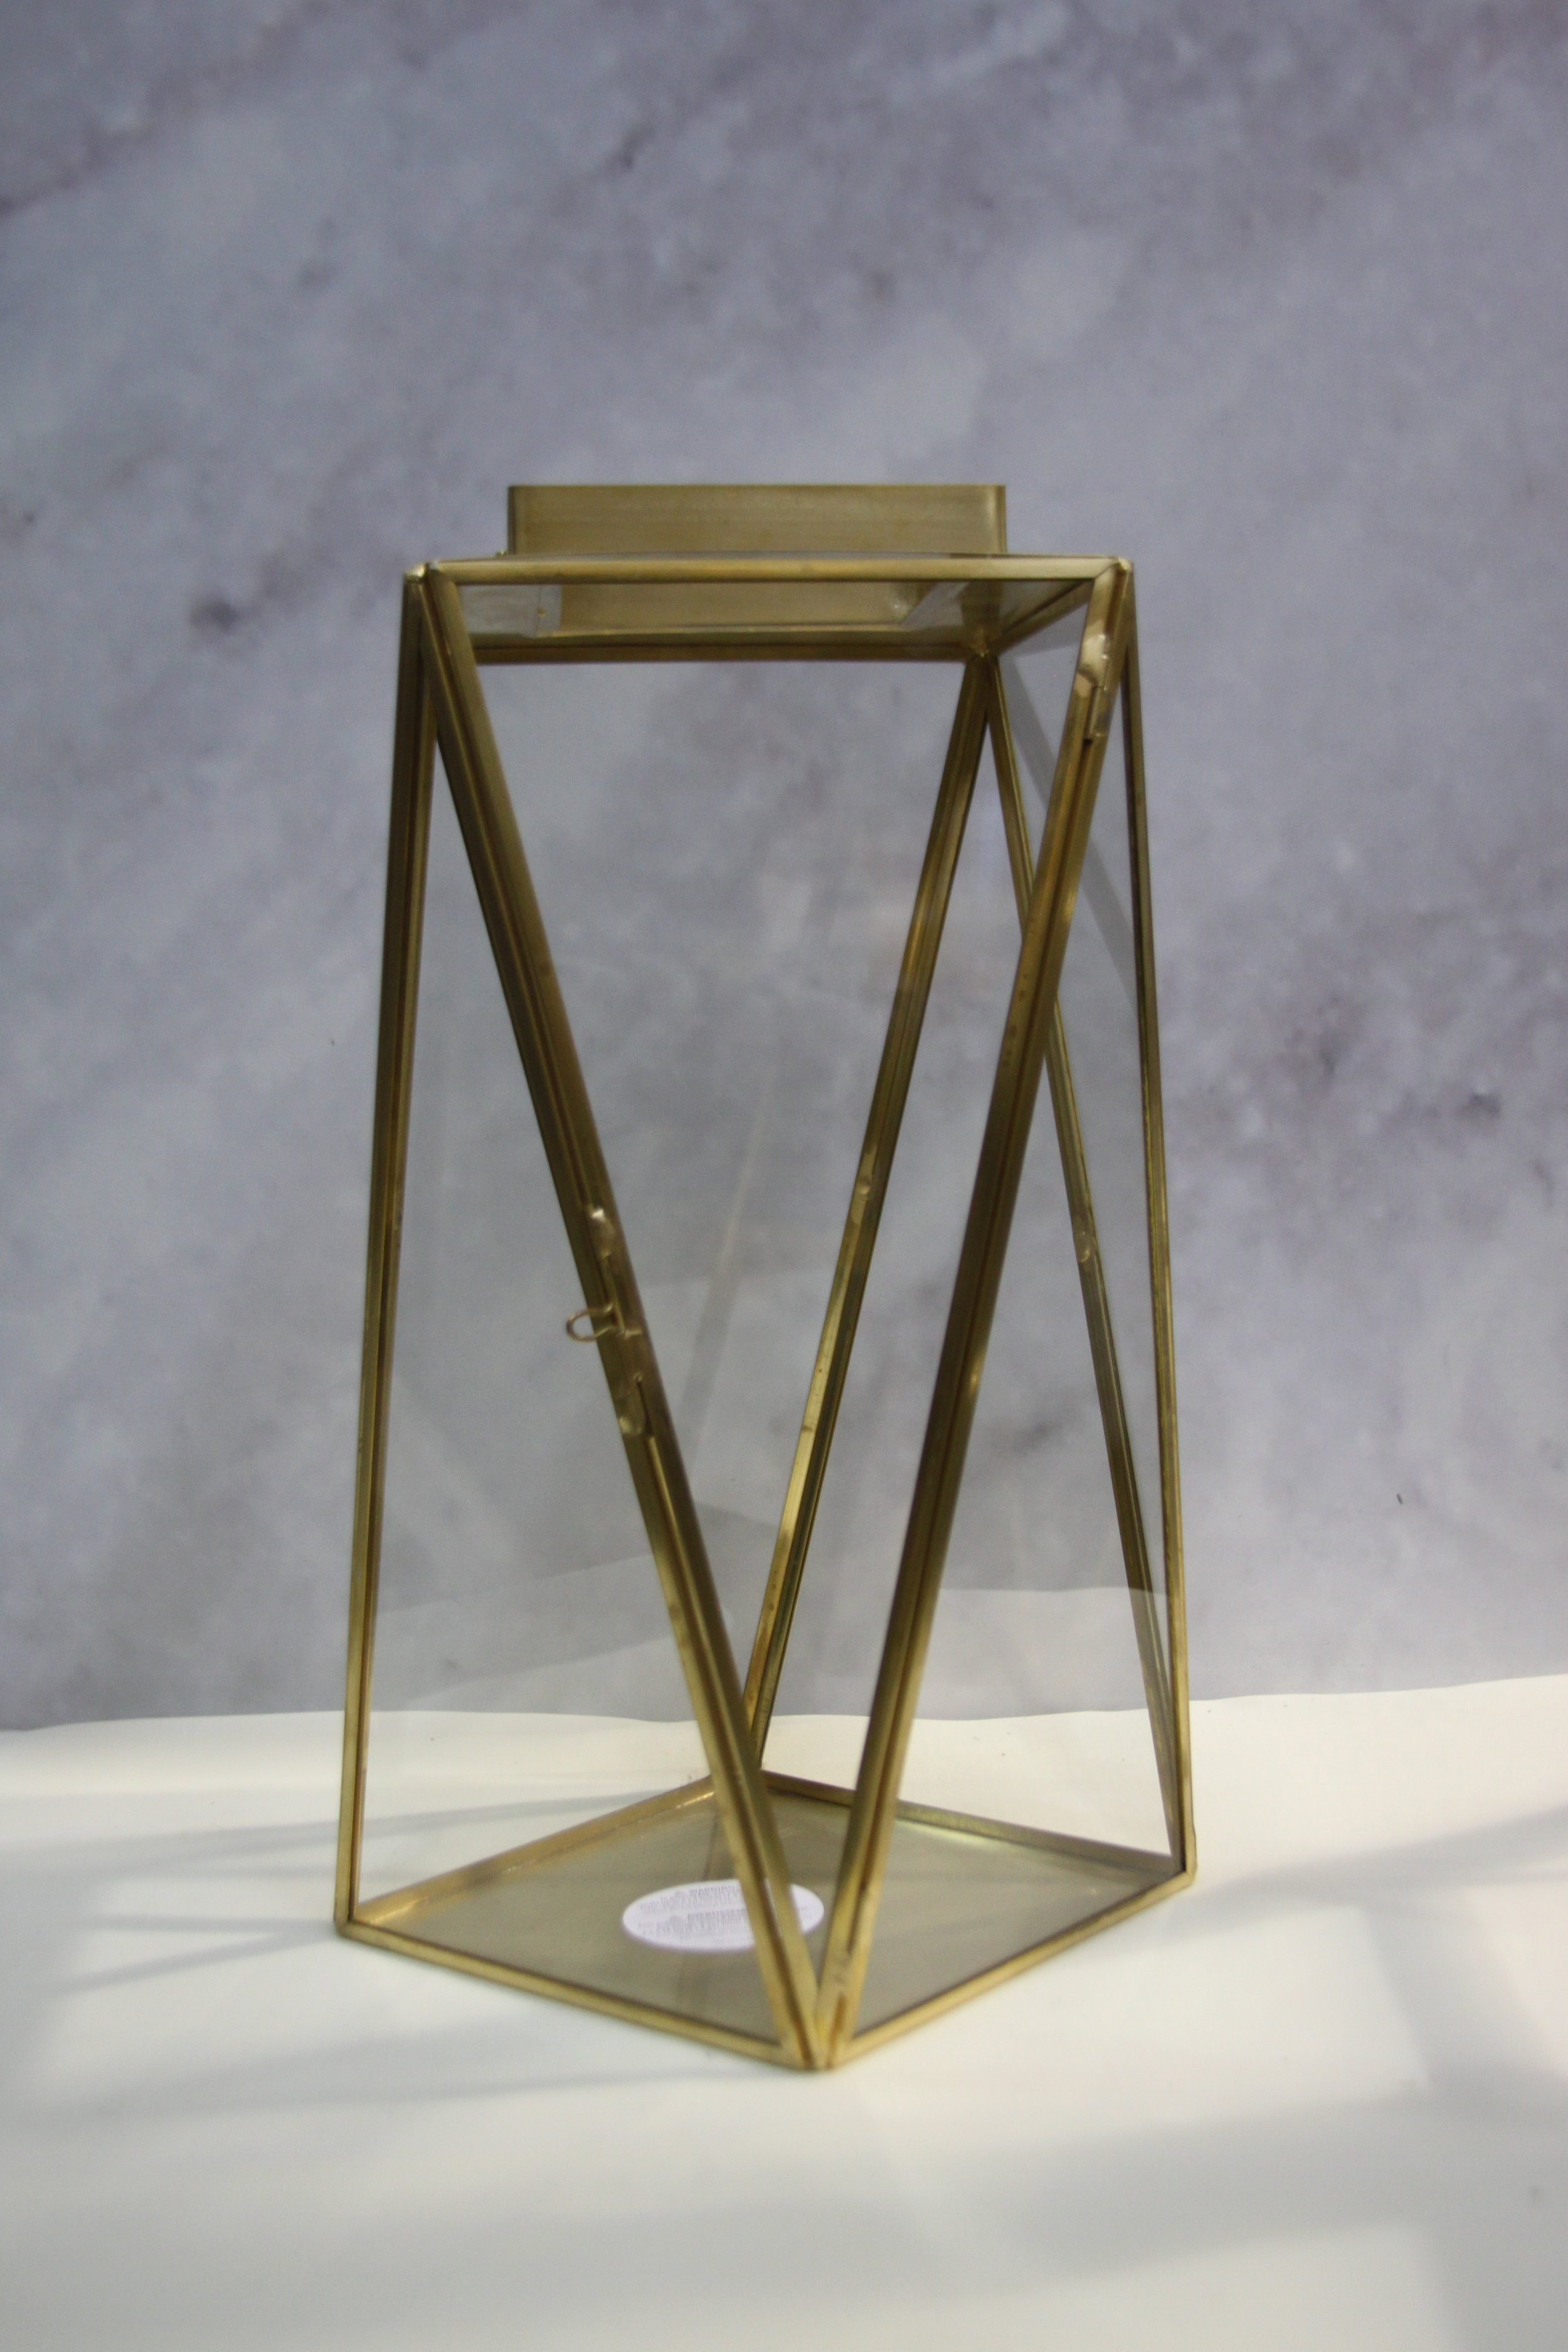 LA-4: Geometric Lantern